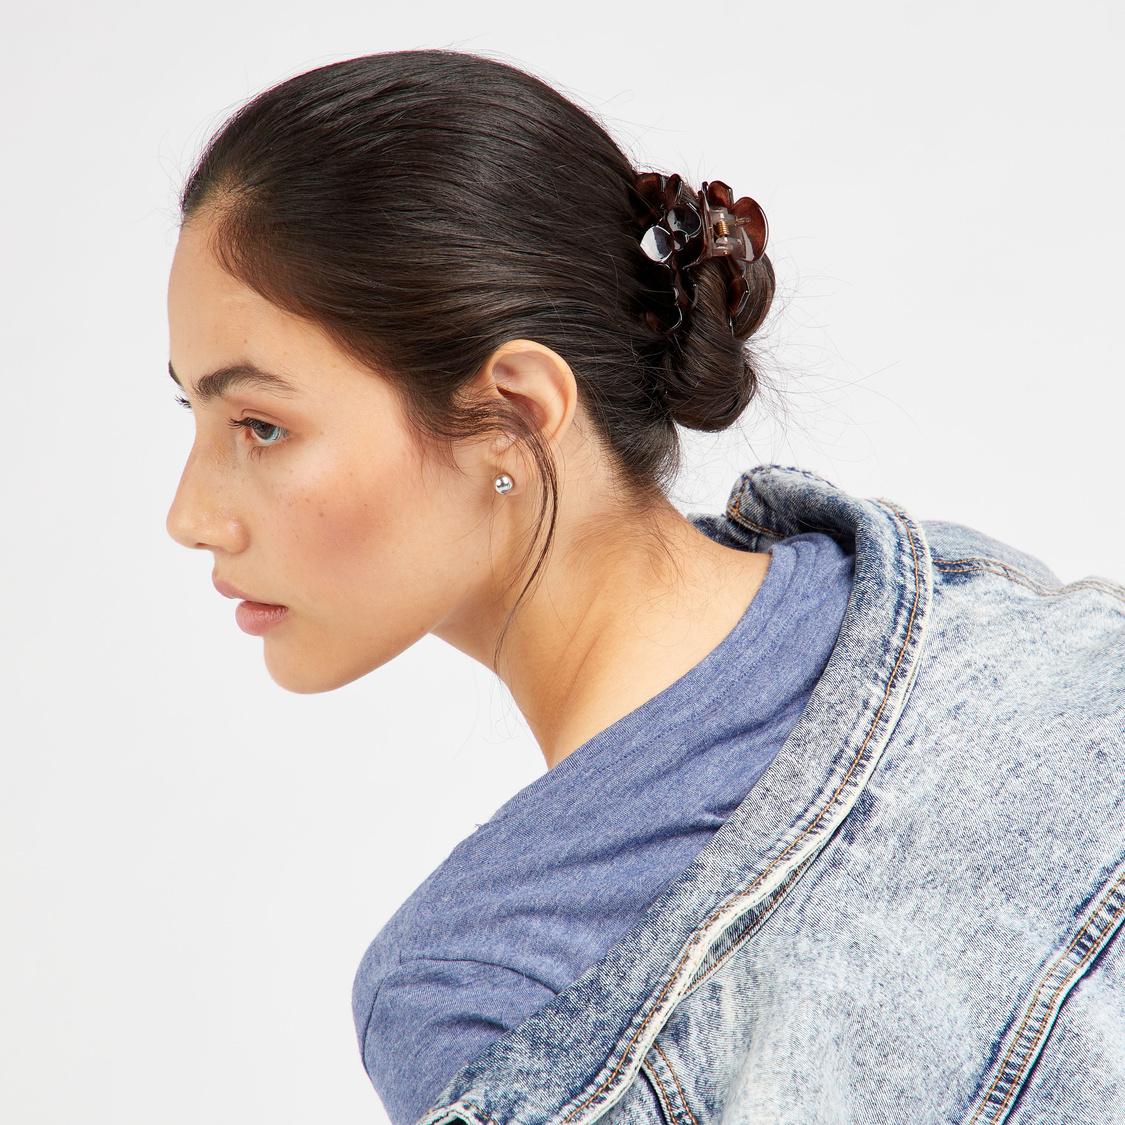 مشابك شعر بزخارف أزهار - طقم من 3 قطع